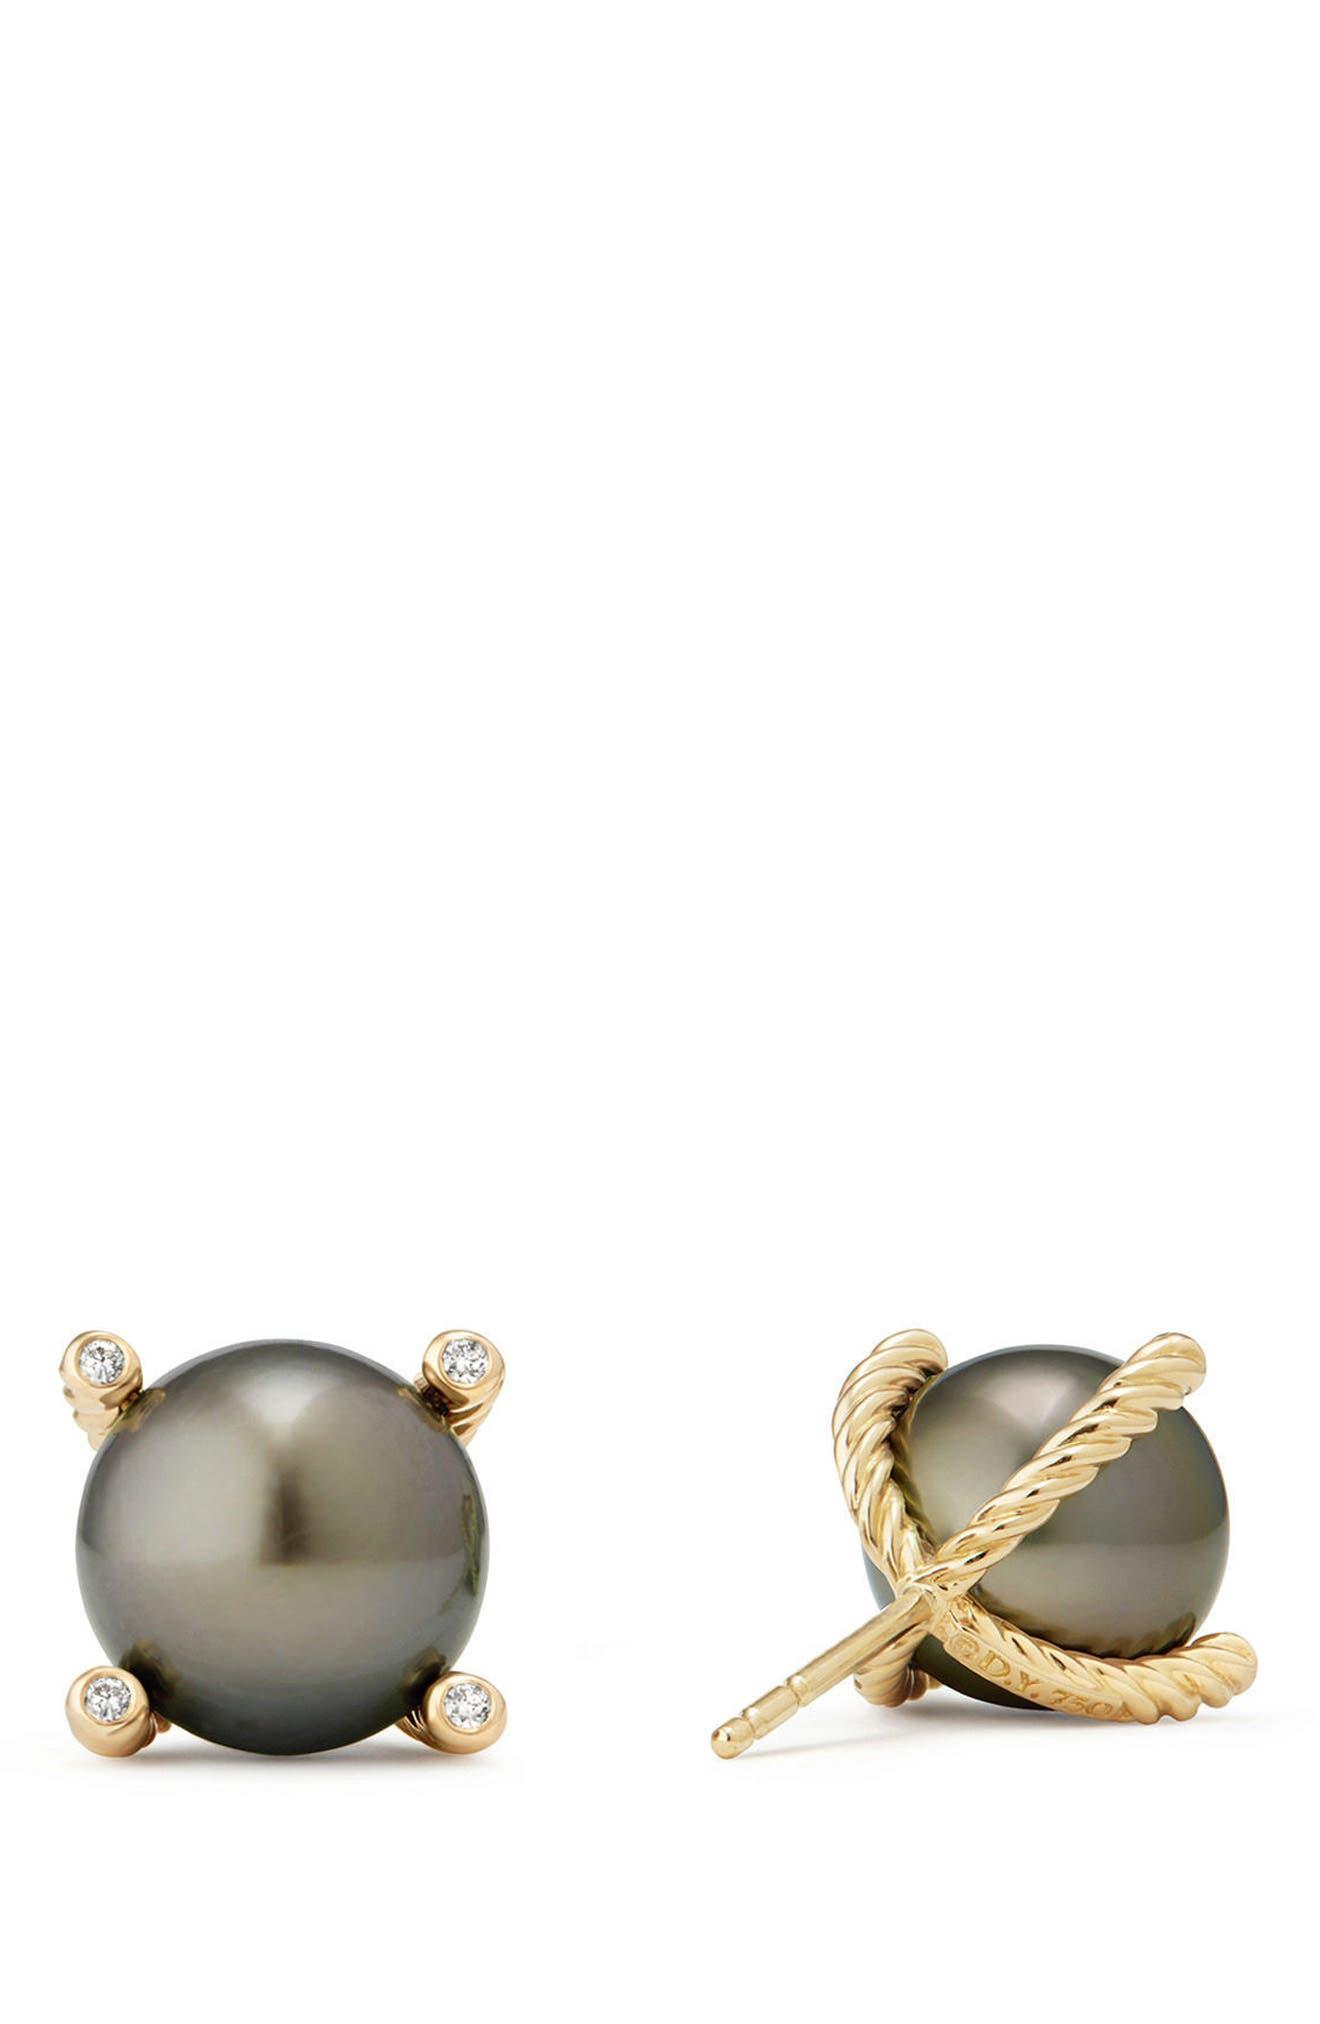 DAVID YURMAN, Genuine Pearl Earrings with Diamonds in 18K Gold, Alternate thumbnail 3, color, GOLD/ TAHITIAN GREY PEARL